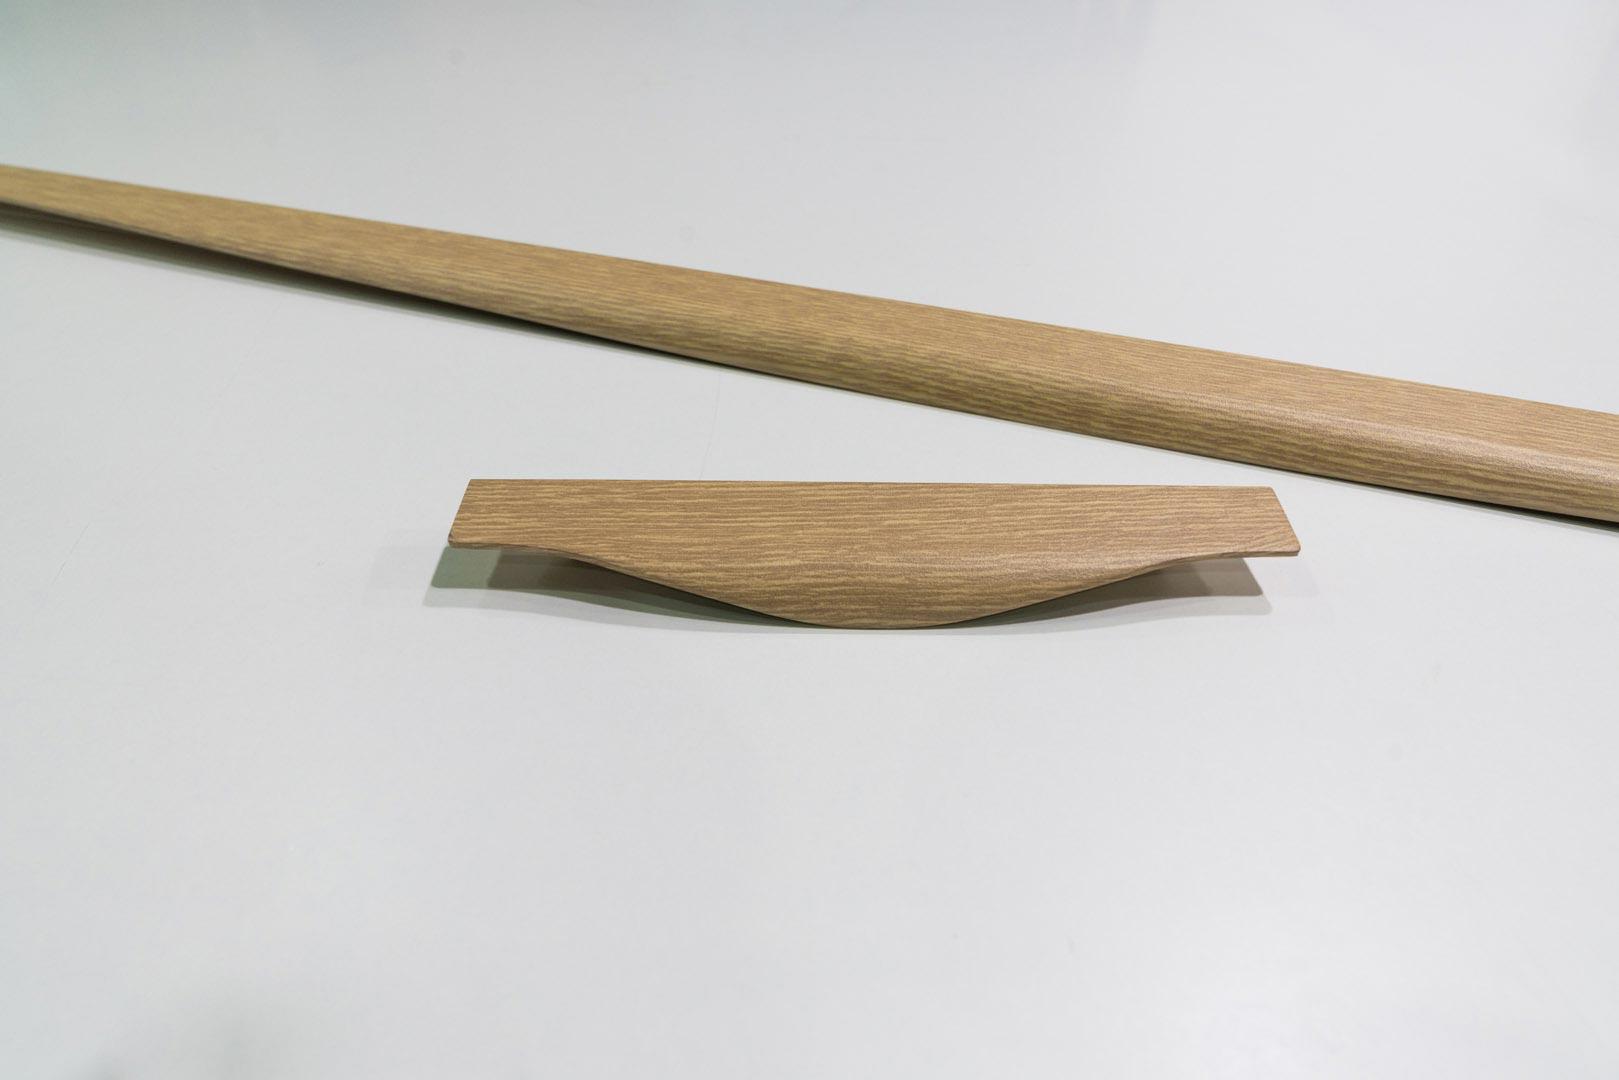 Tirador-mueble-sublimado-acabado-madera